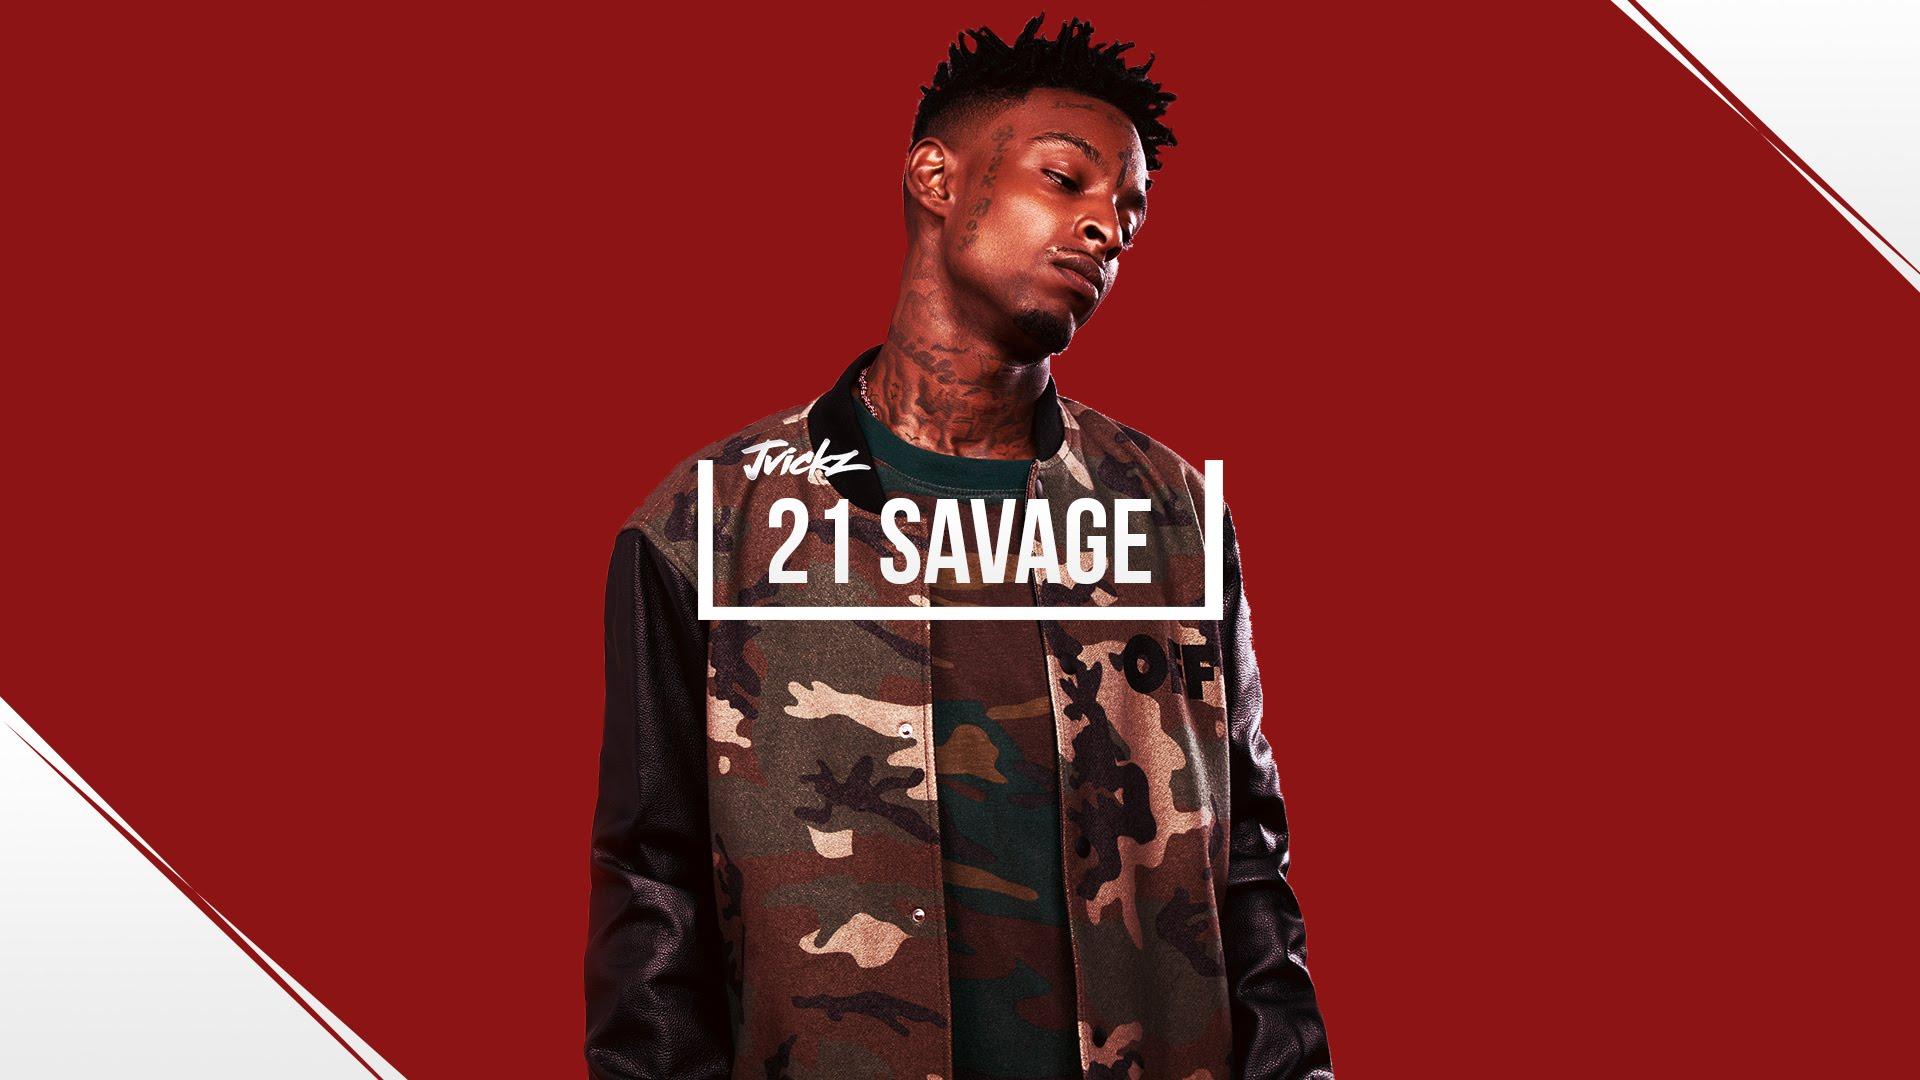 10 21 Savage Fondos de pantalla HD | Fondos de Escritorio - Wallpaper Abyss